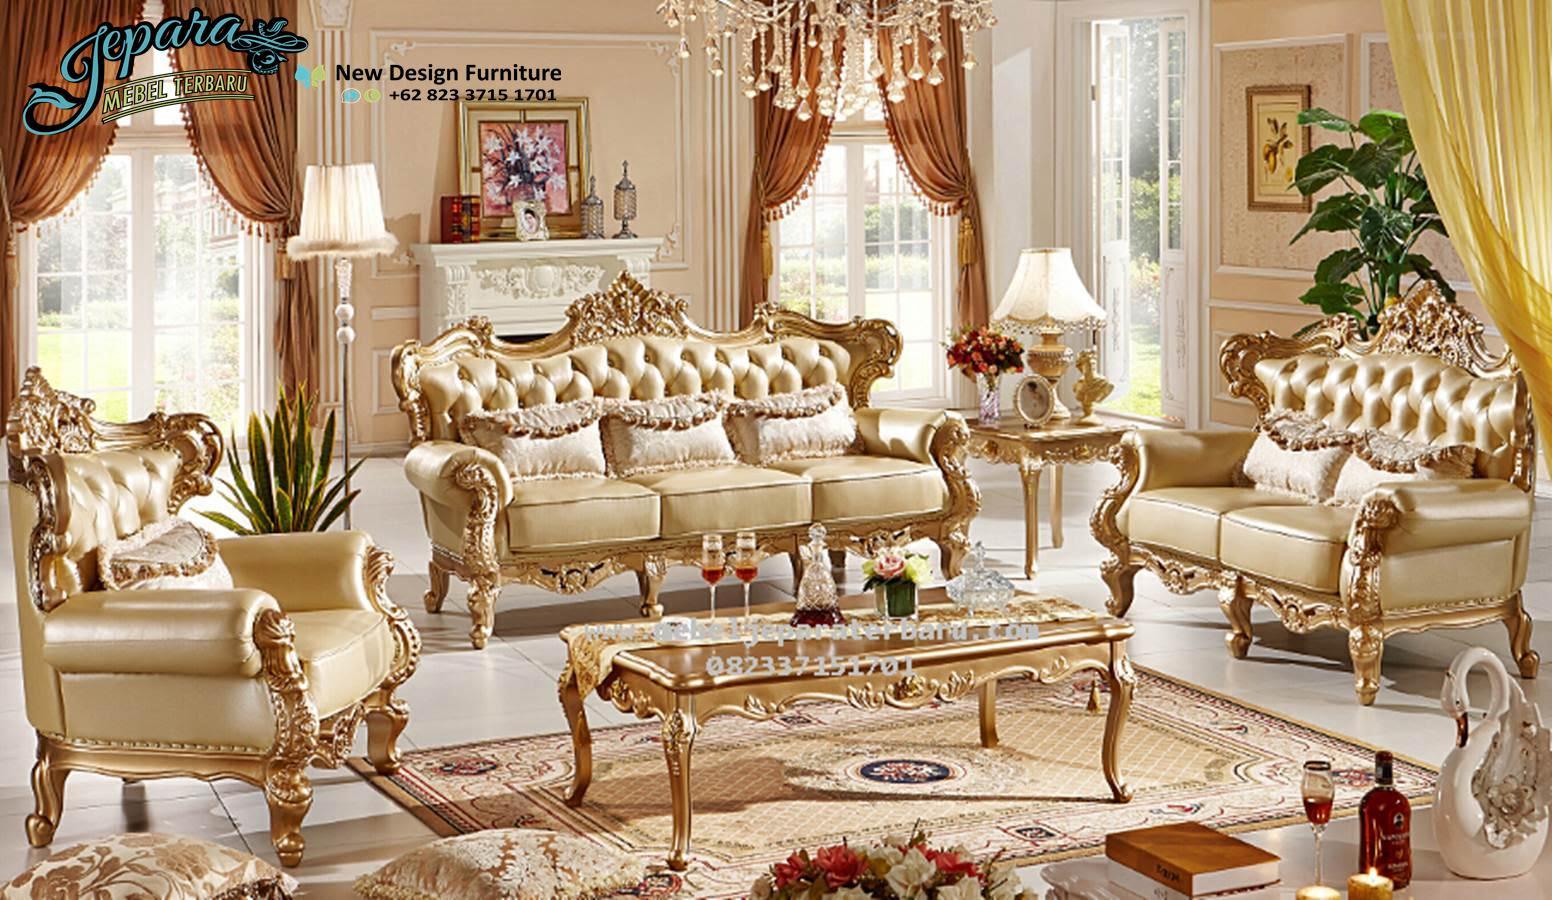 Sofa Ruang Keluarga Mewah Terbaru SST 072 Sofa Ruang Keluarga Sofa